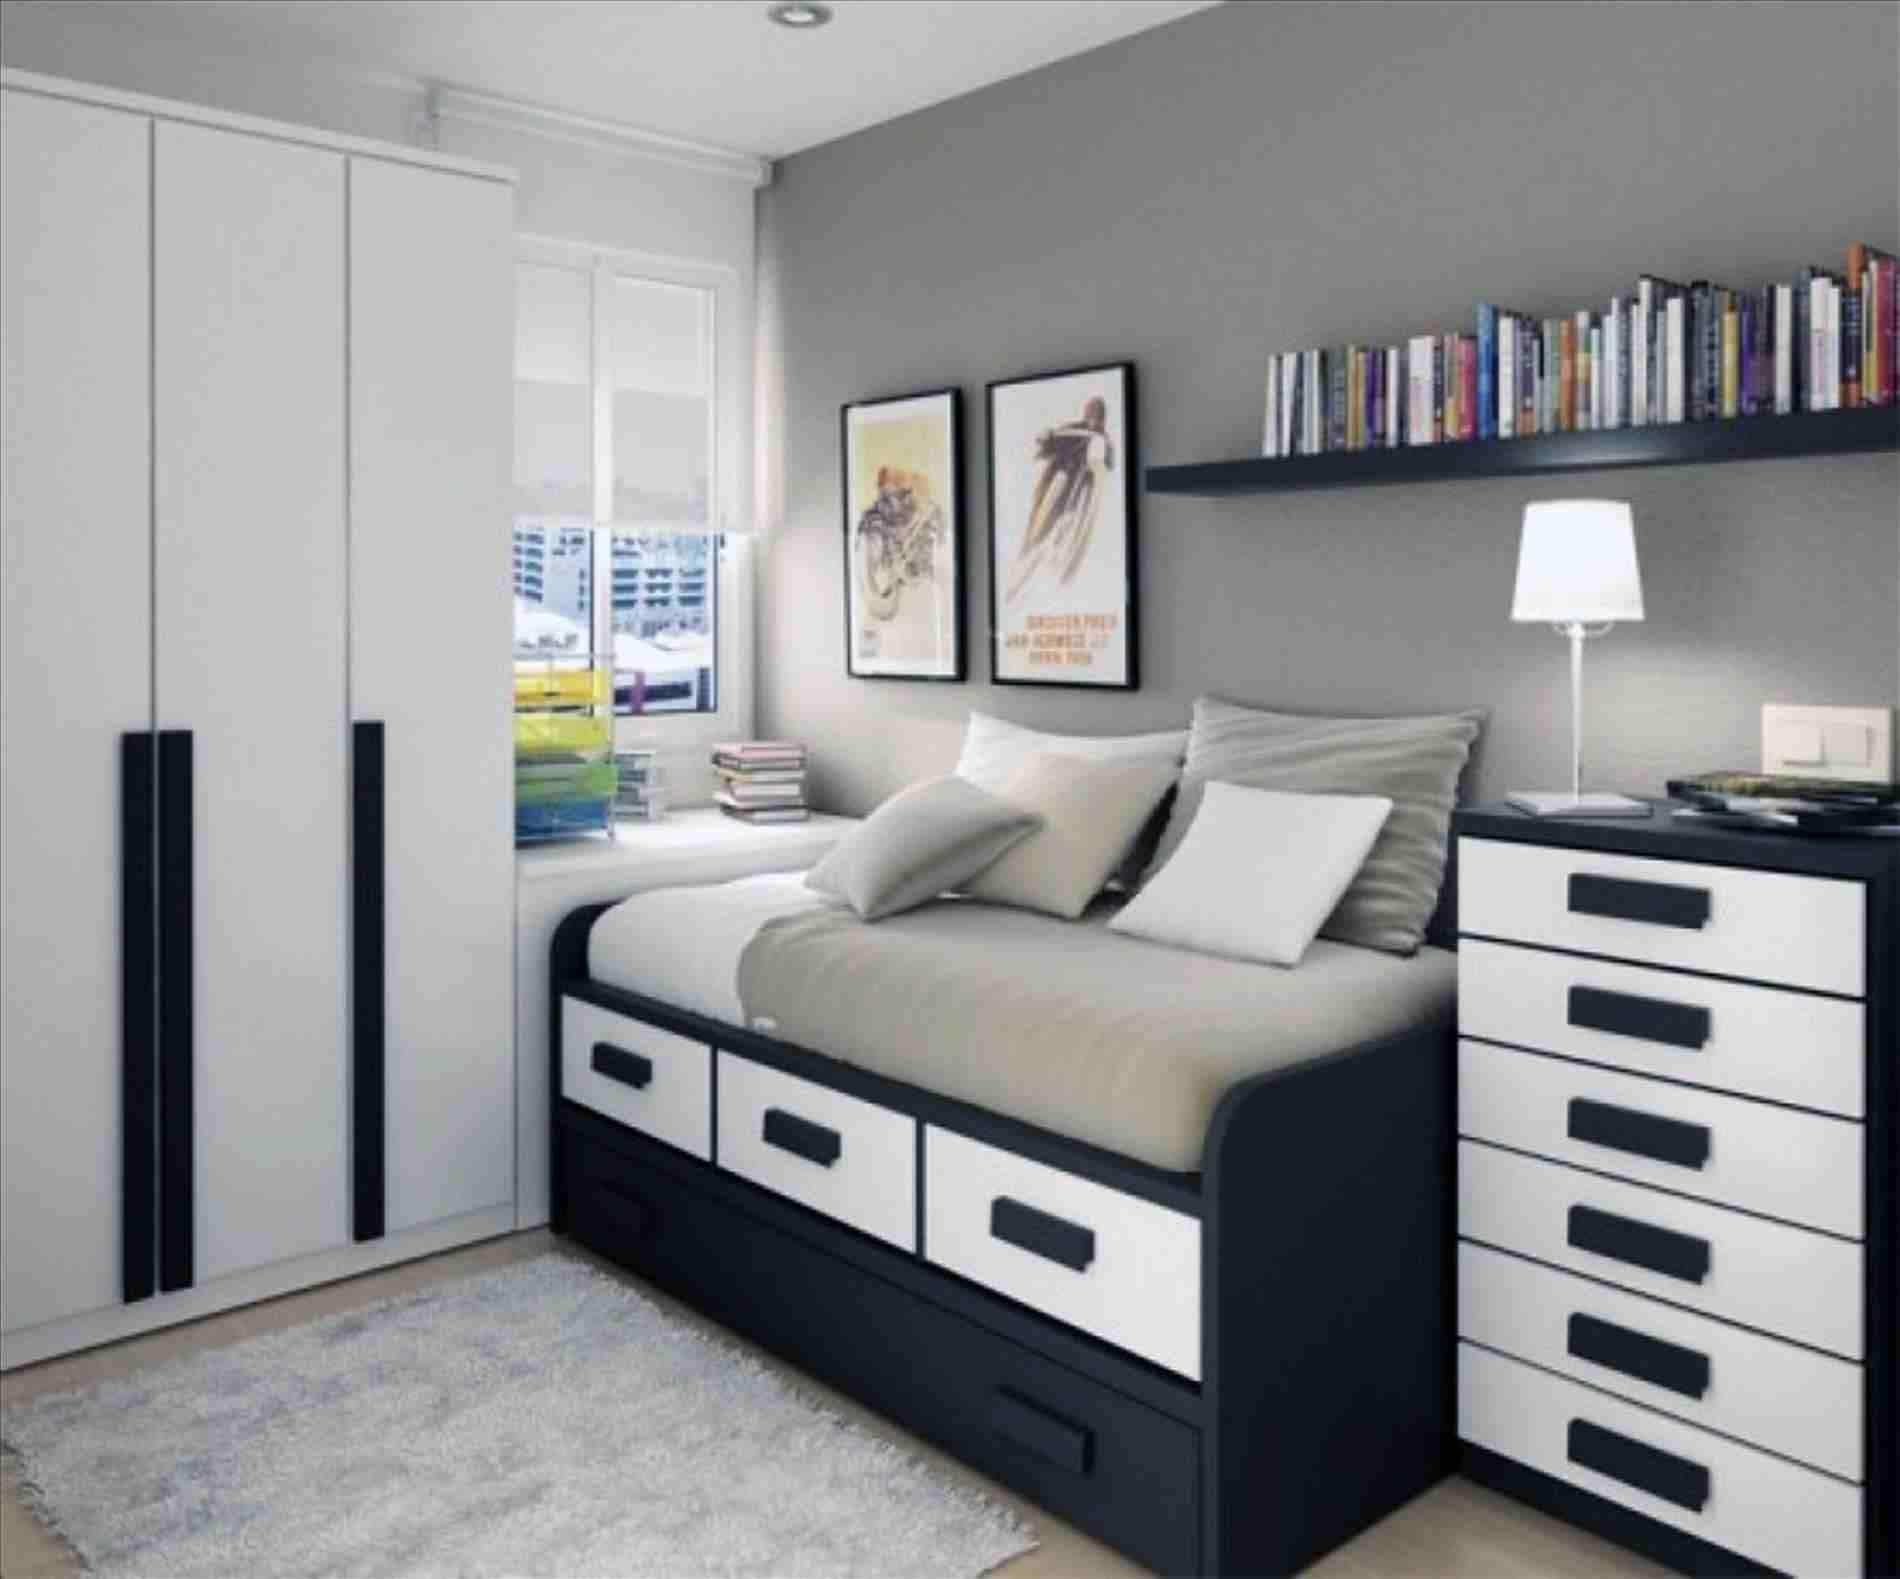 Pin On Teen Girl Bedroom Ideas, Teenage Girl Bedroom Furniture For Small Rooms